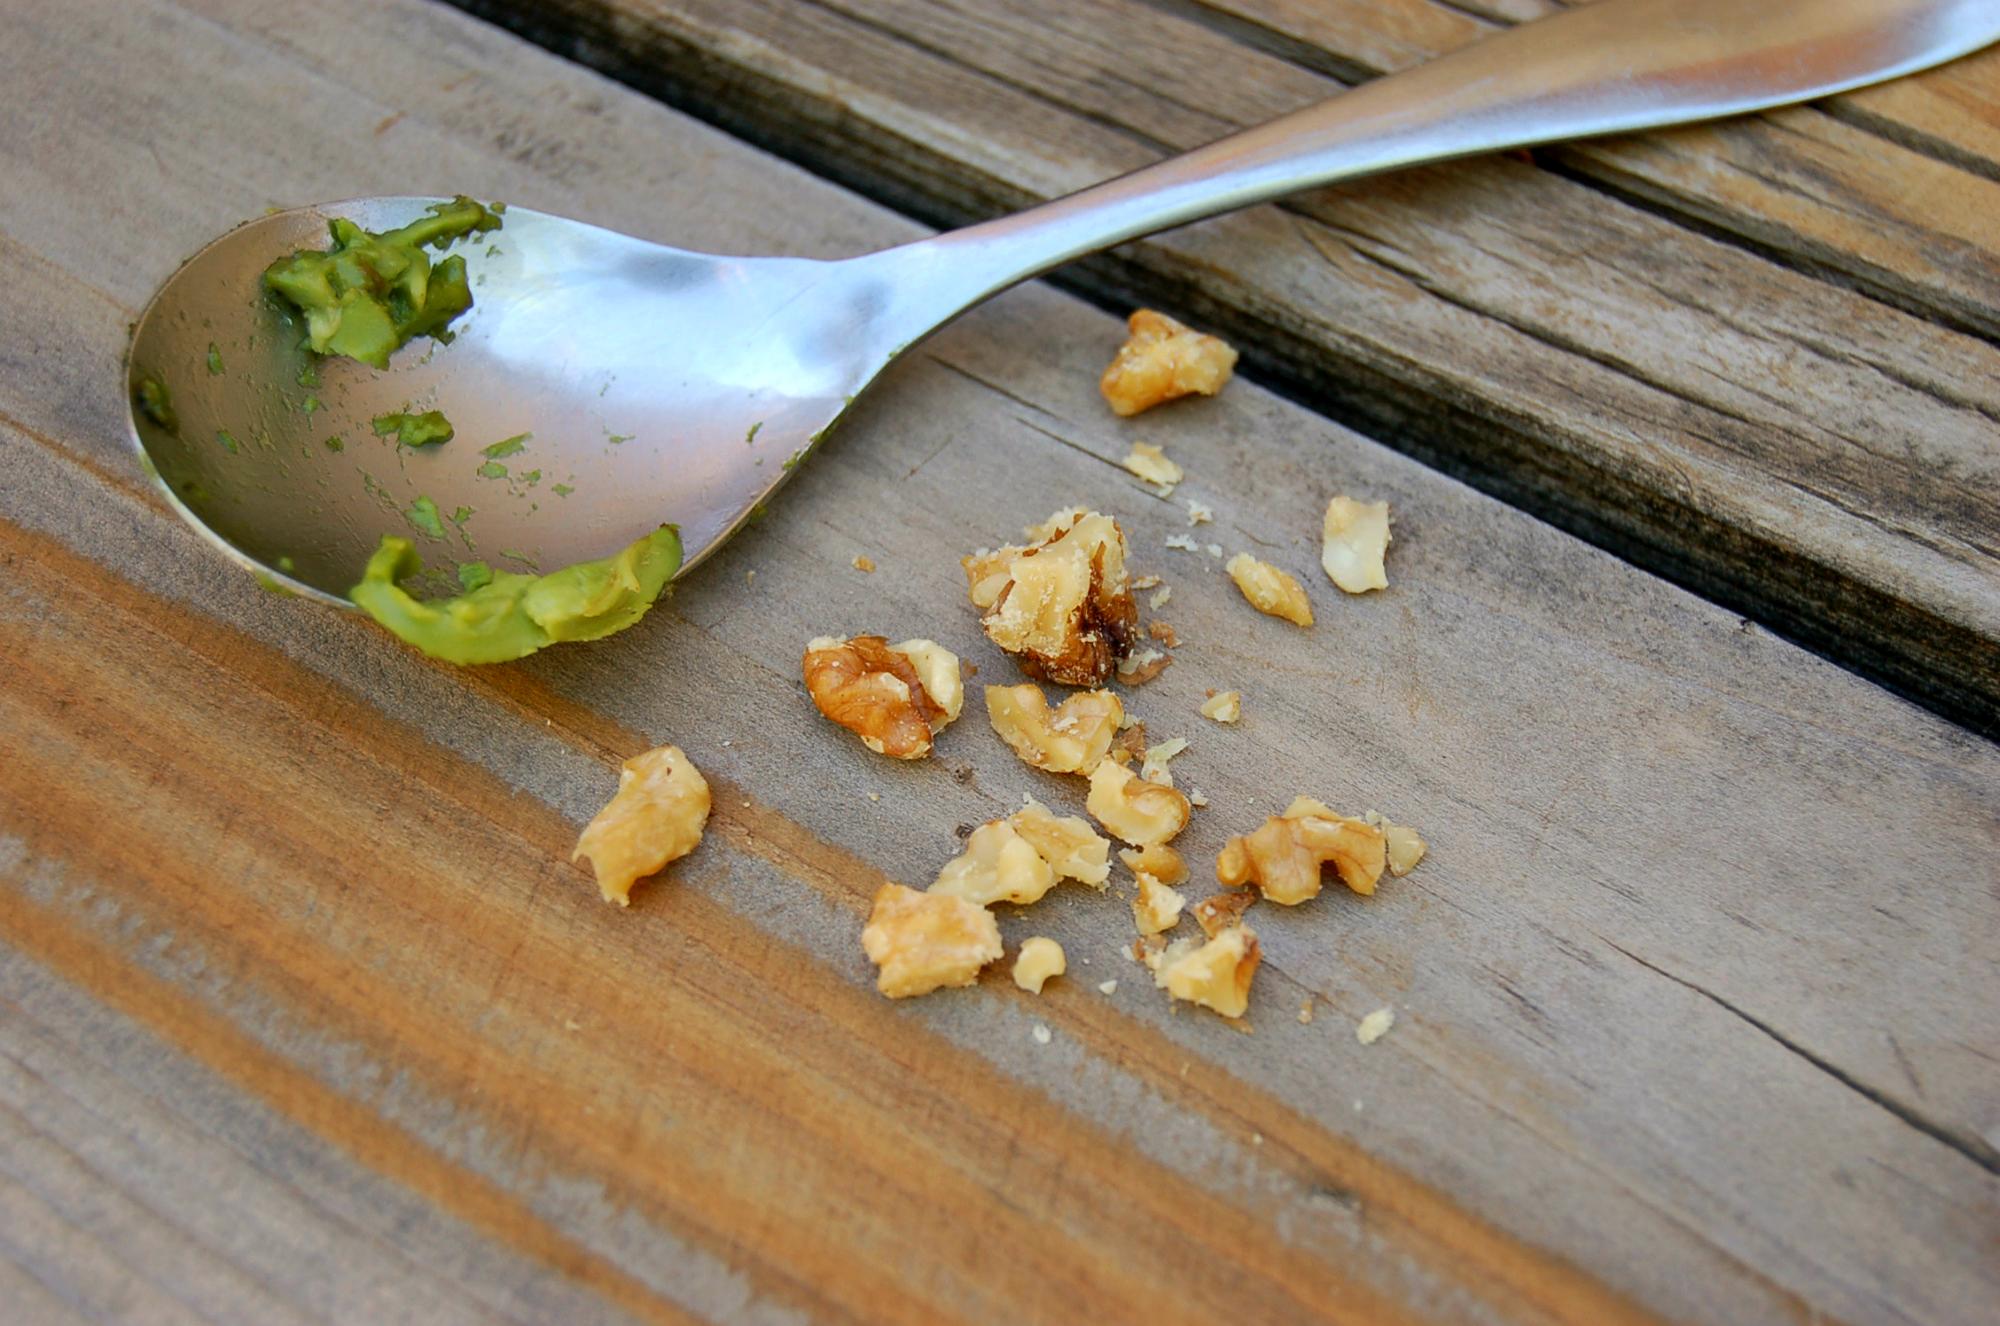 easy_quinoa_and_veggies_walnuts_and_avo